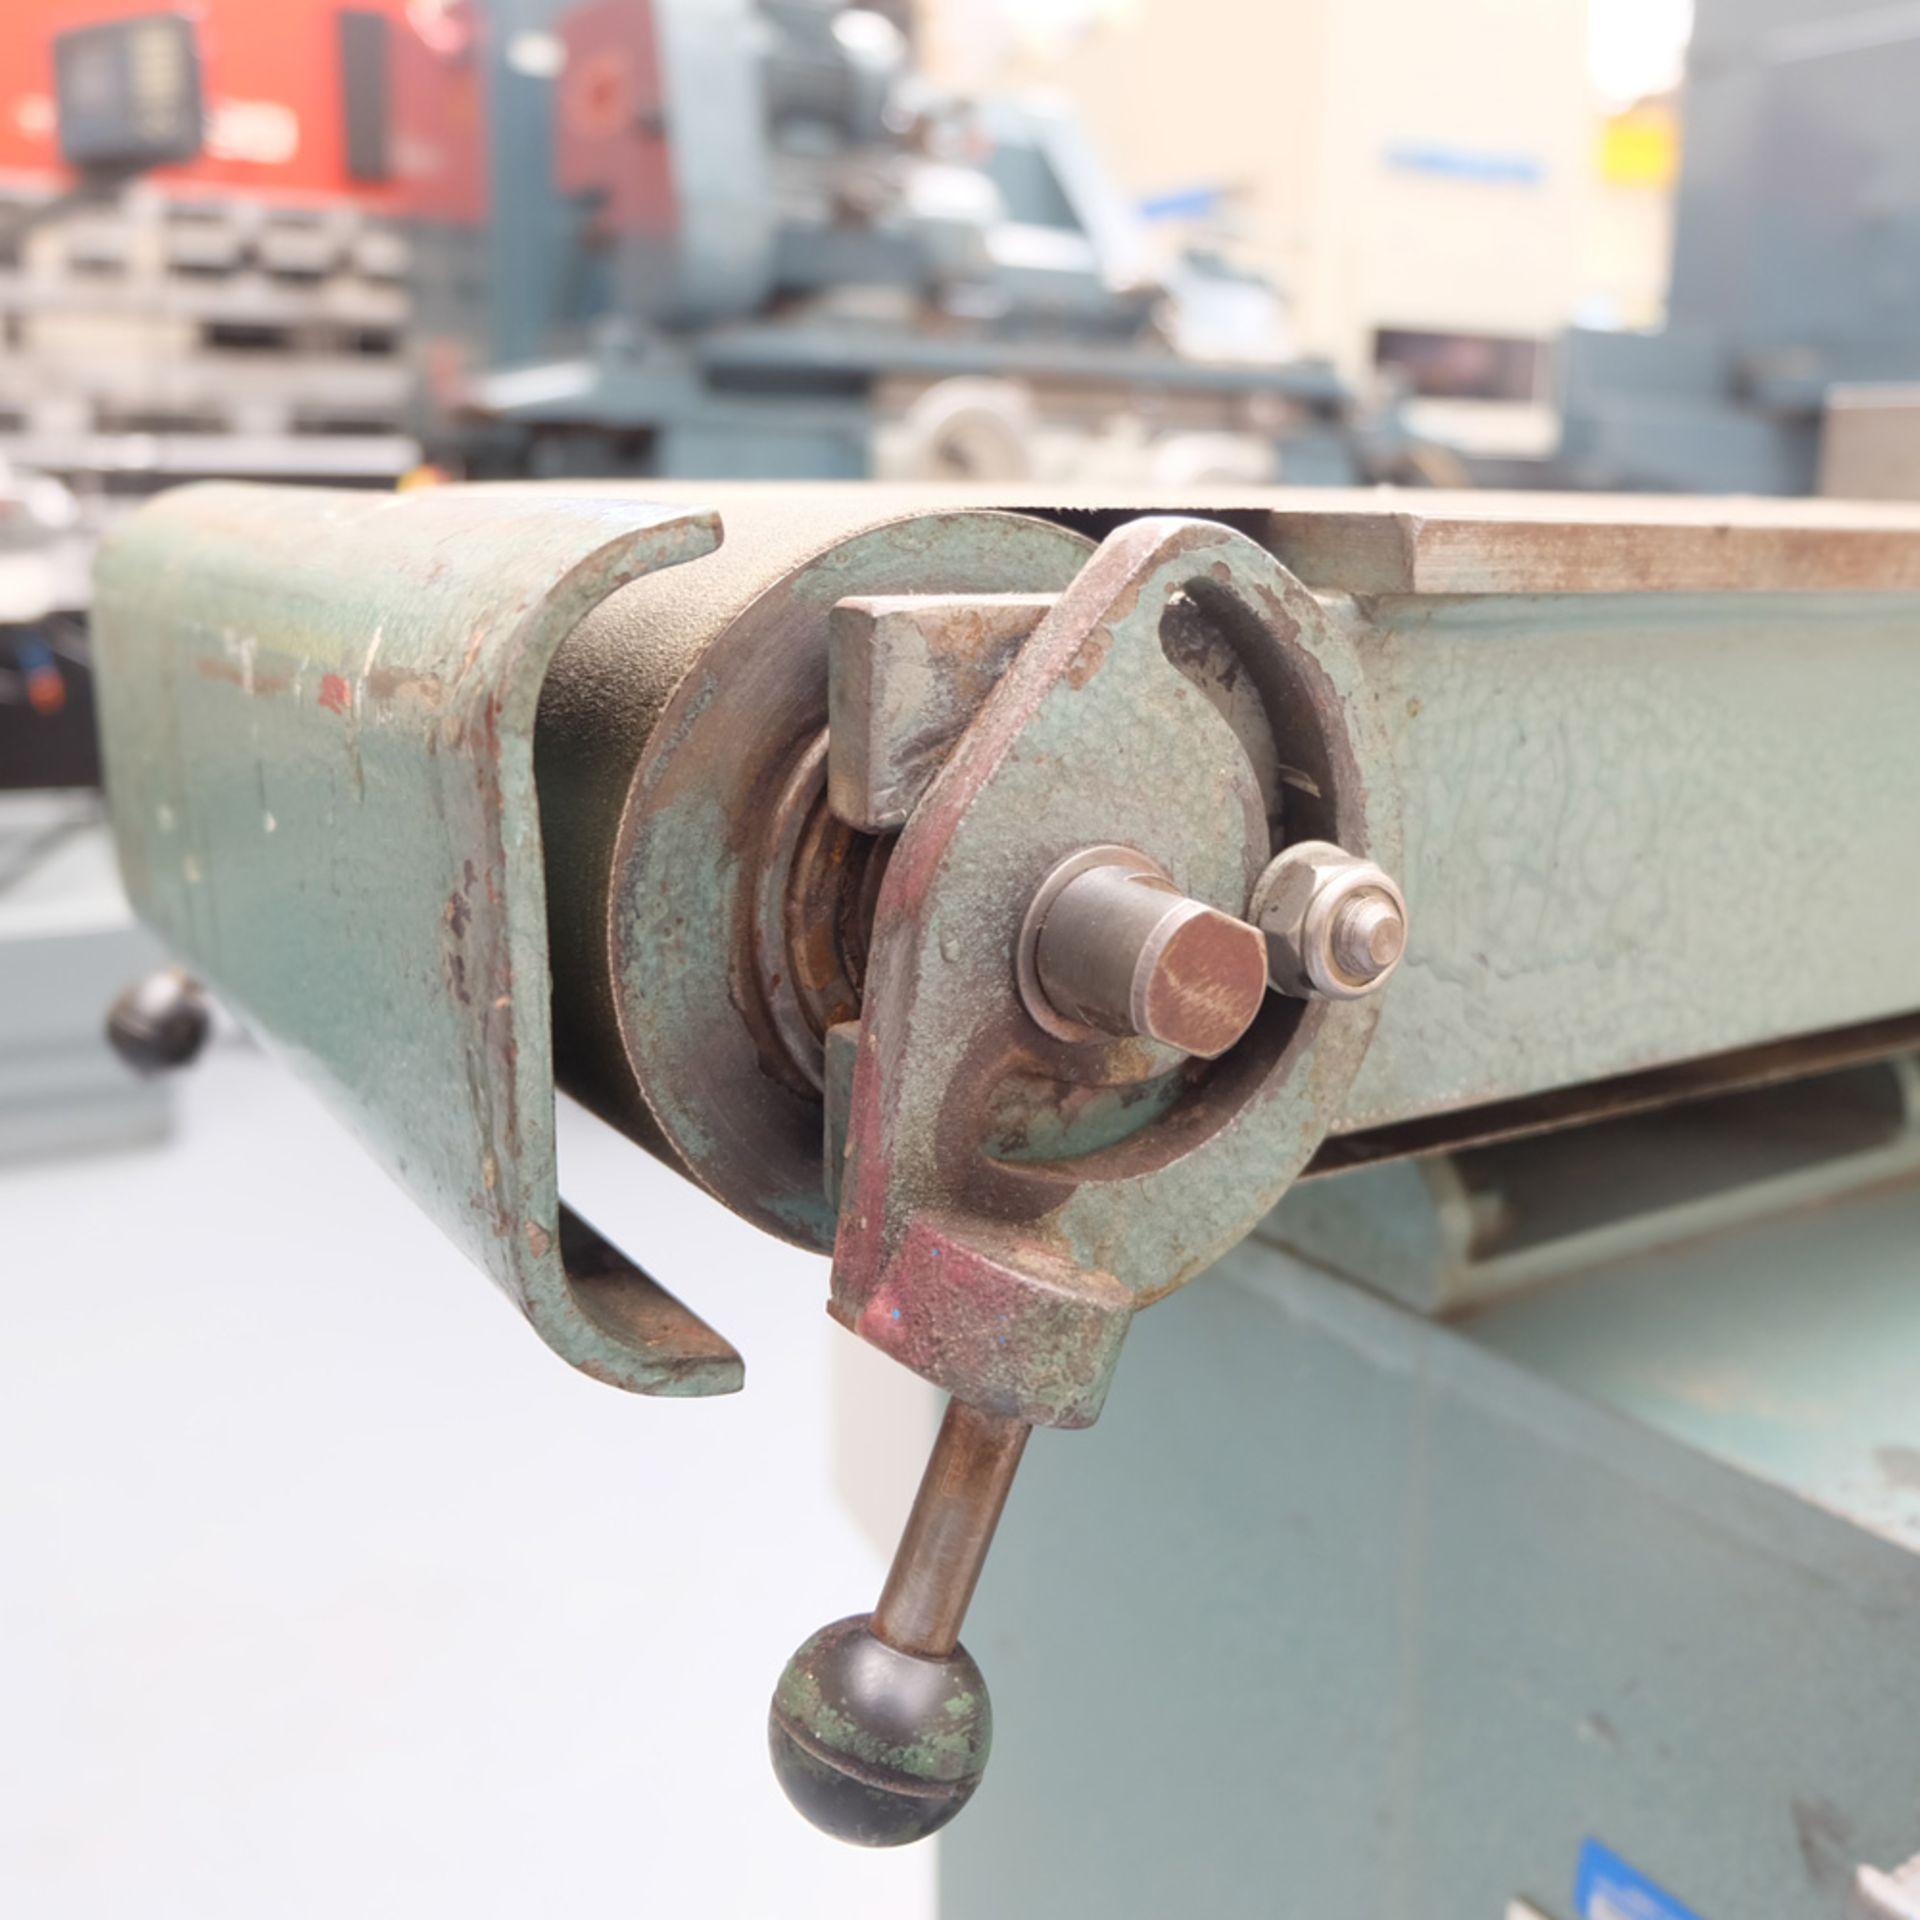 RJH Model 'Moose' Heavy Duty Horizontal Bandfacing / Linishing Machine. - Image 6 of 7